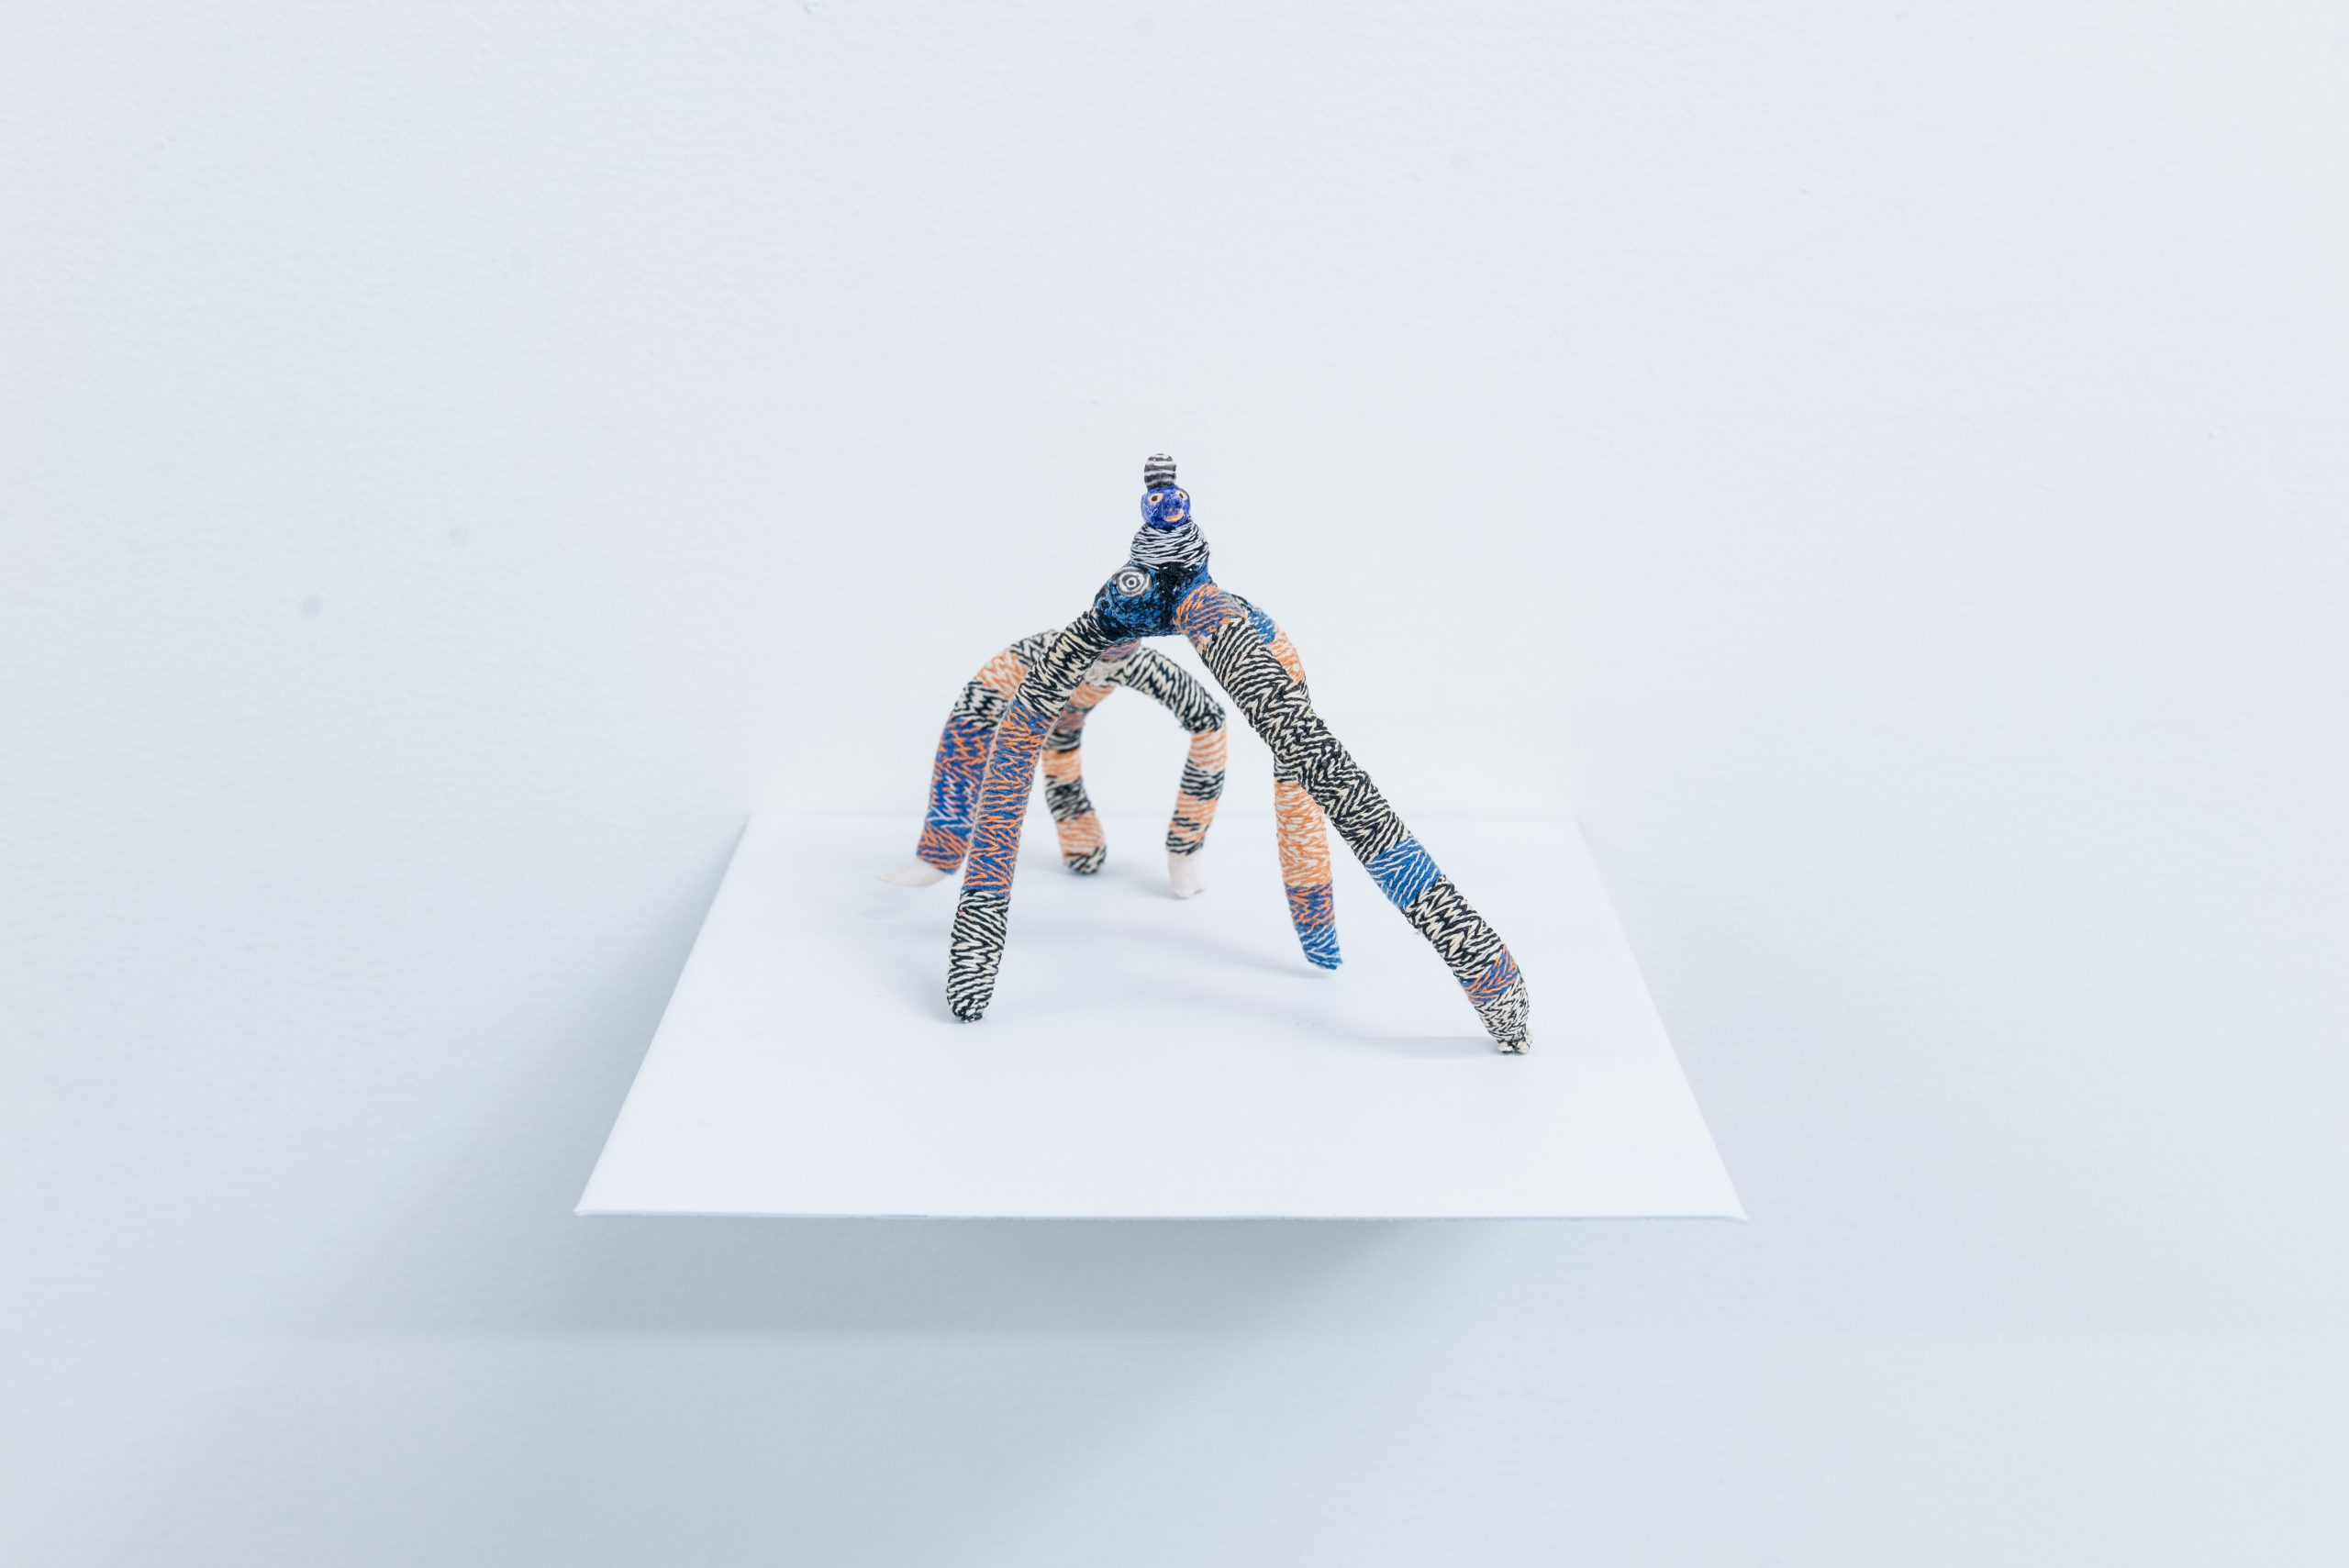 The Creep by Em Kettner; a six-legged, woven, porcelain figure looks straight ahead